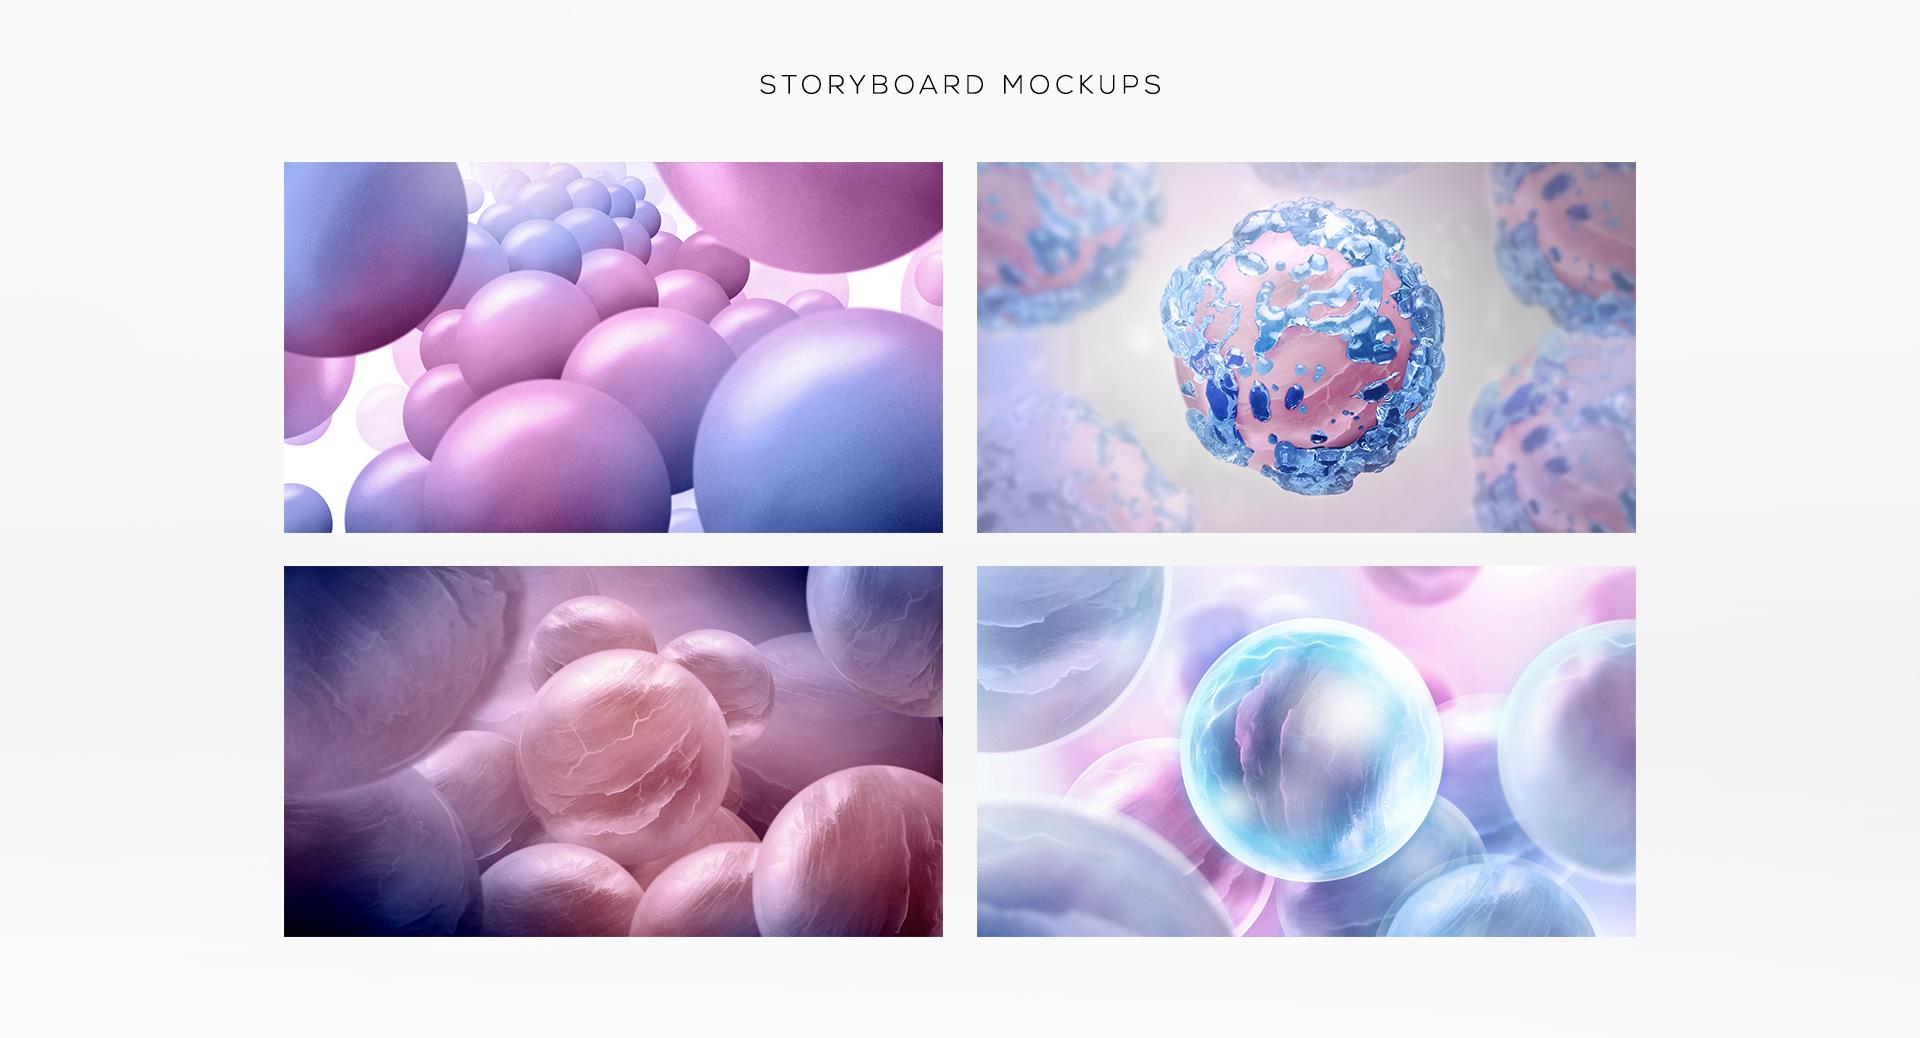 8.Storyboard.jpg